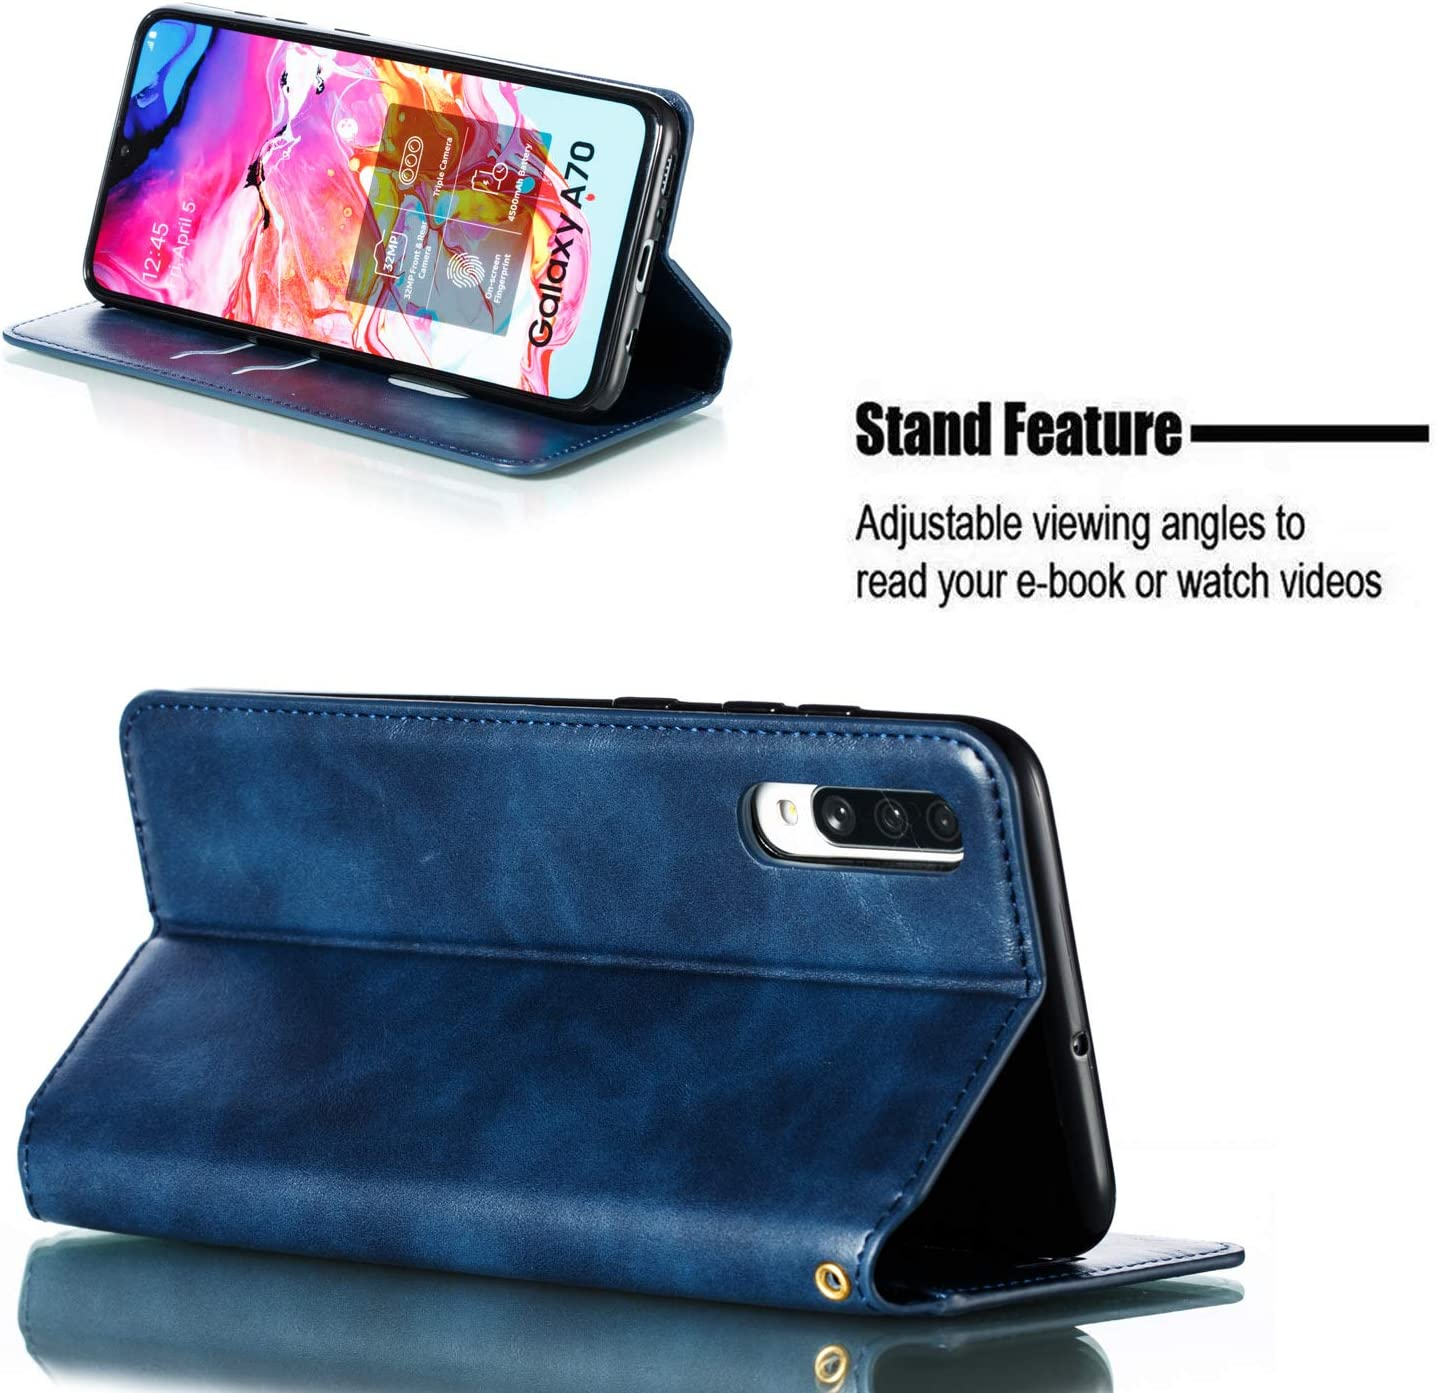 Brieftasche Handyh/ülle Klapph/ülle mit Kartenhalter Stossfest Lederh/ülle f/ür Samsung Galaxy A70 Tosim Galaxy A70 H/ülle Klappbar Leder TOYTE020113 Rot